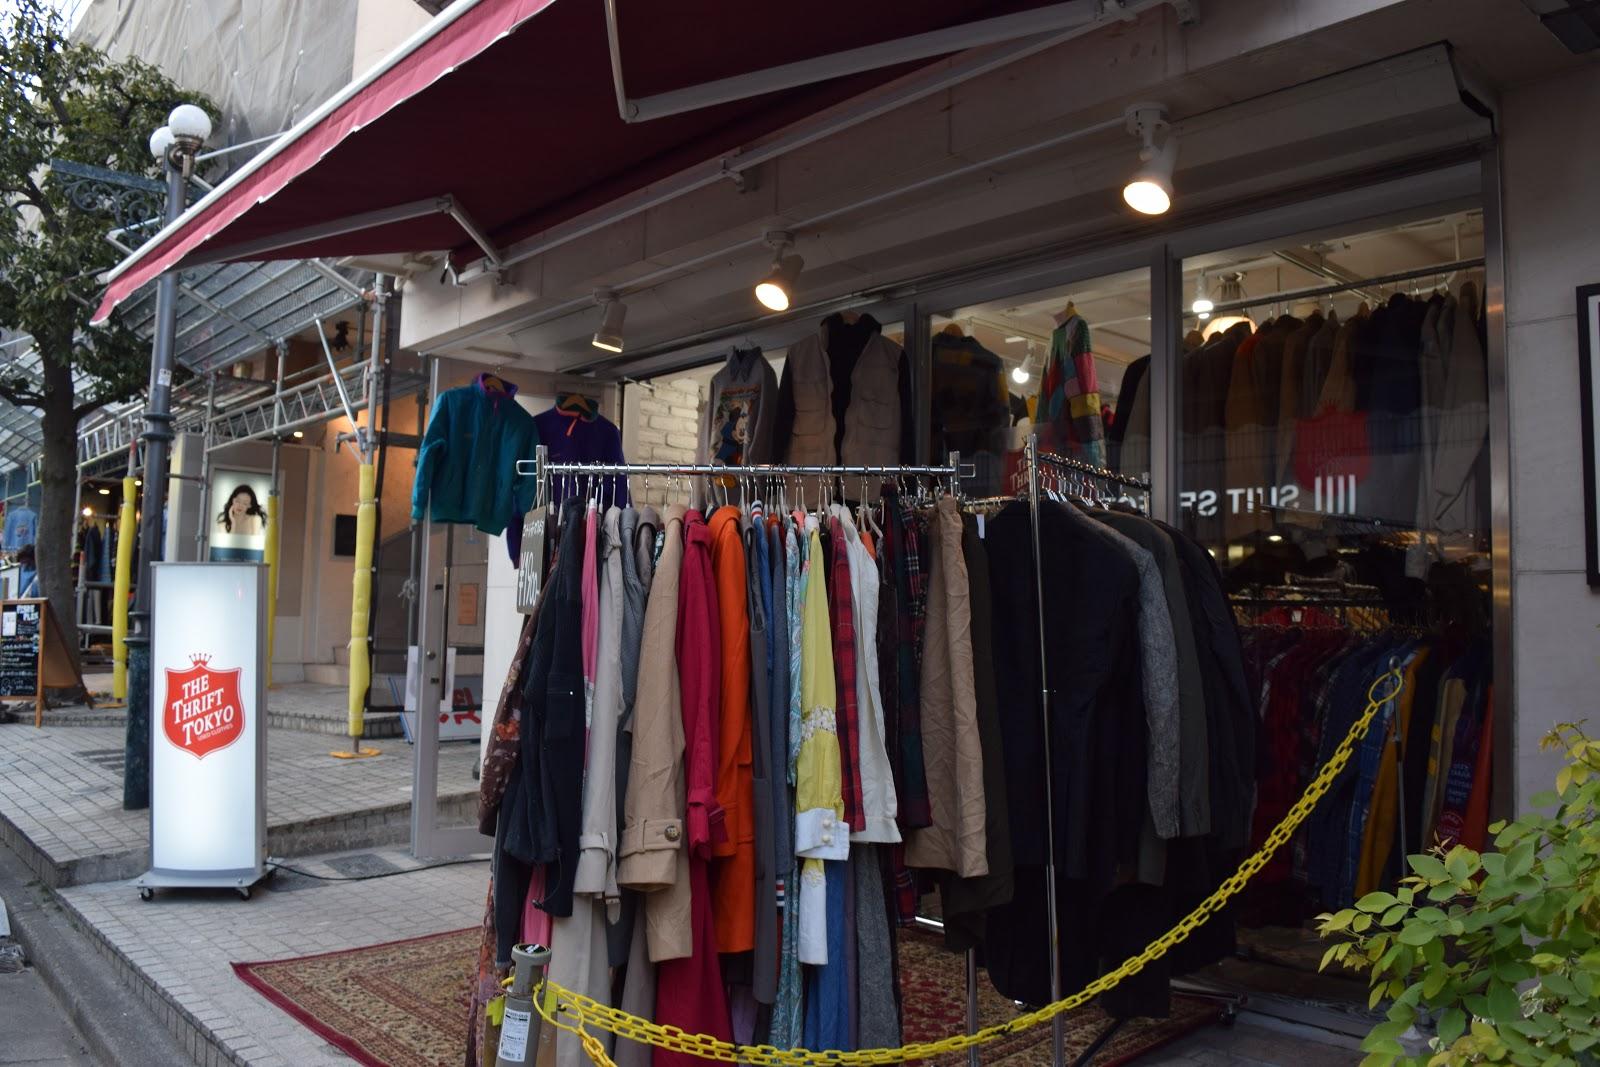 The Thrift Tokyo Shimokitazawa vintage clothes store